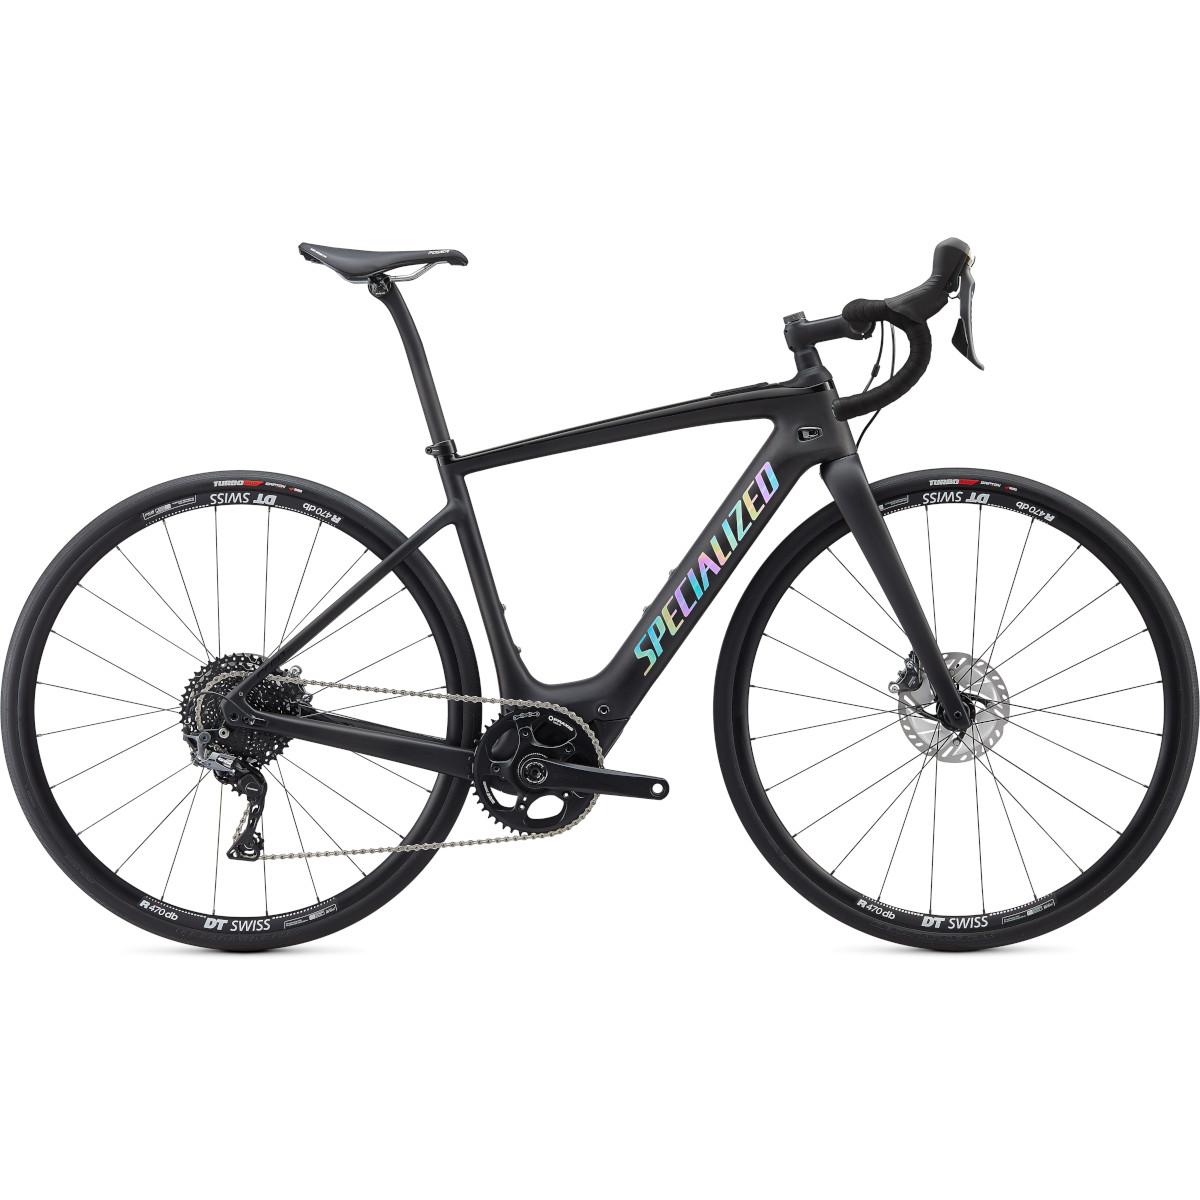 Produktbild von Specialized TURBO CREO SL COMP - Gravel Carbon E-Bike - 2022 - satin carbon / holo reflective / black